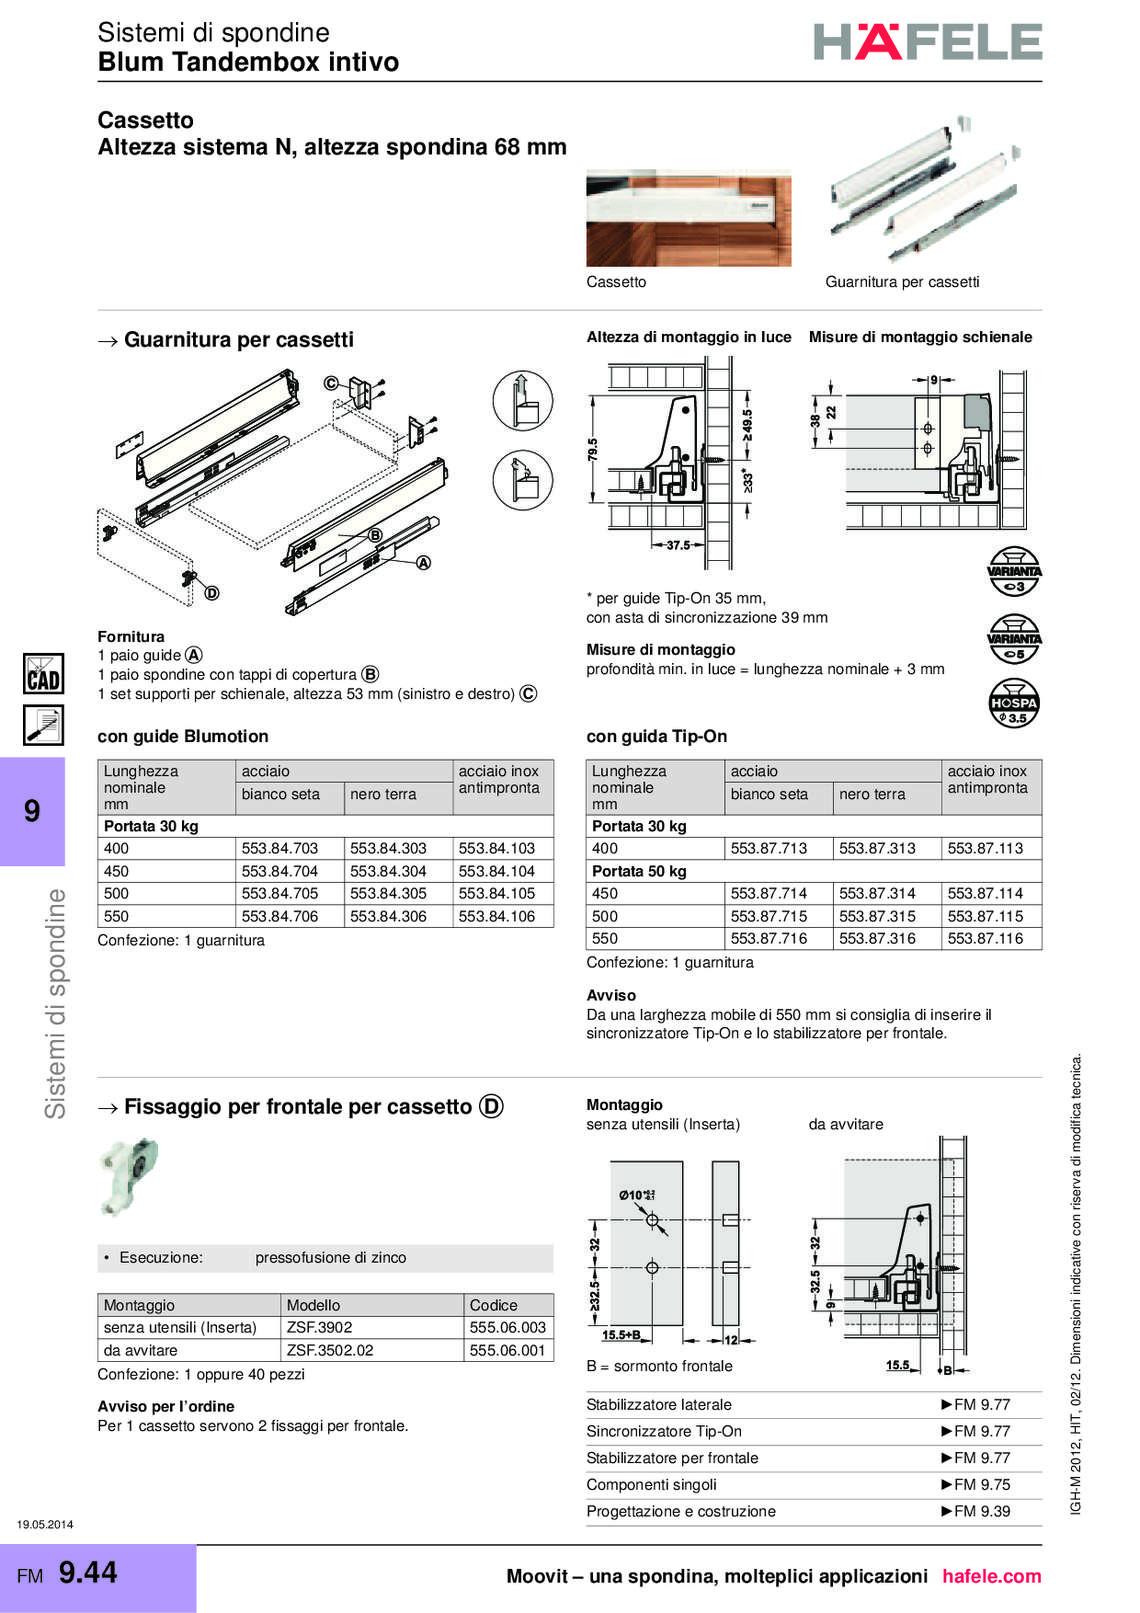 hafele-spondine-e-guide-per-mobili_40_055.jpg